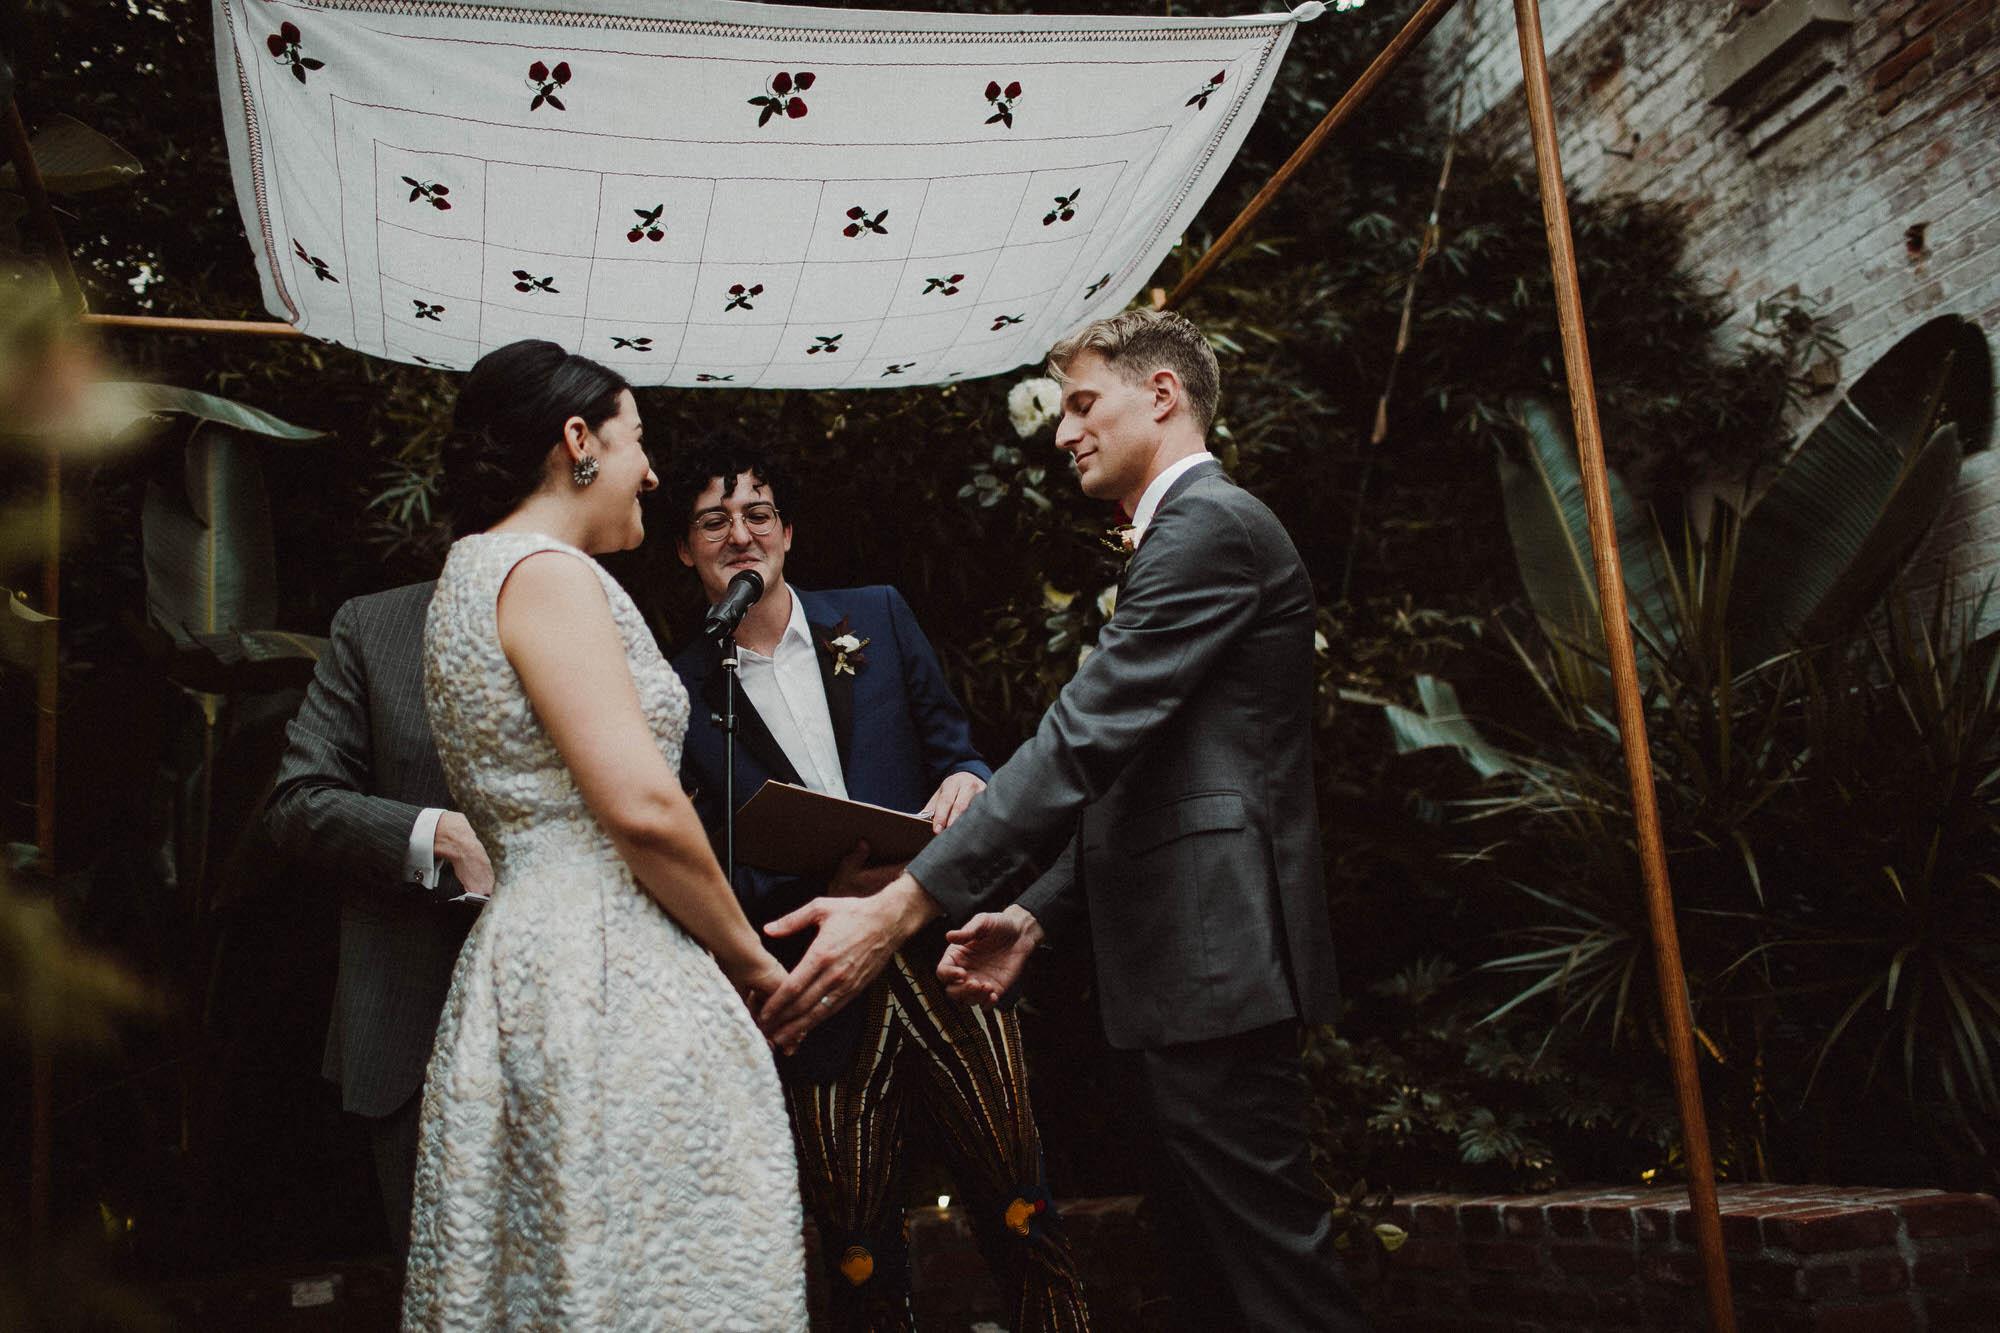 los-angeles-wedding-photographer-millwick-110.jpg